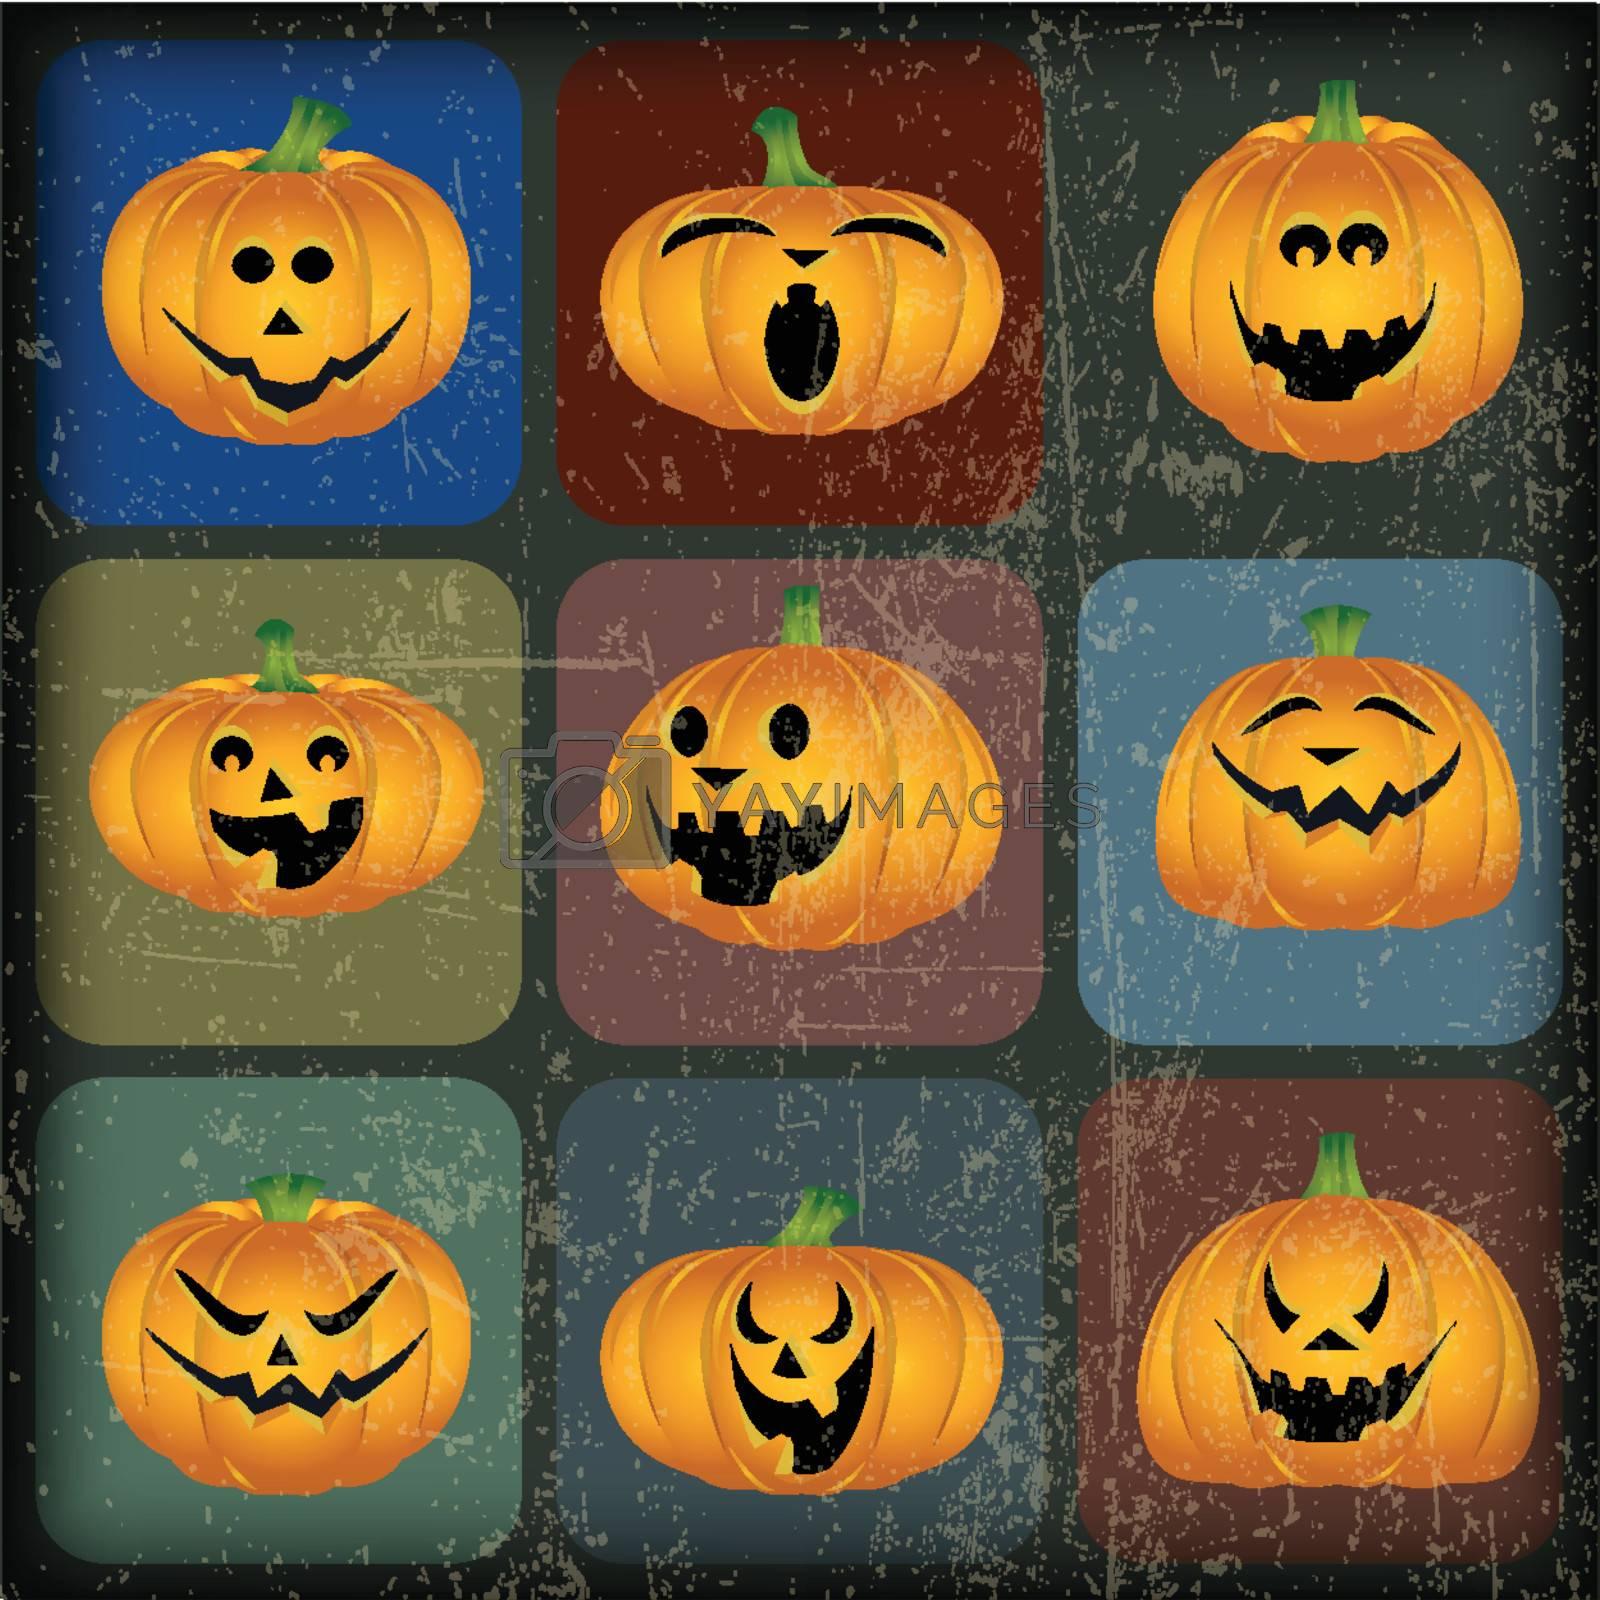 Halloween Pumpkins with Grunge Effect